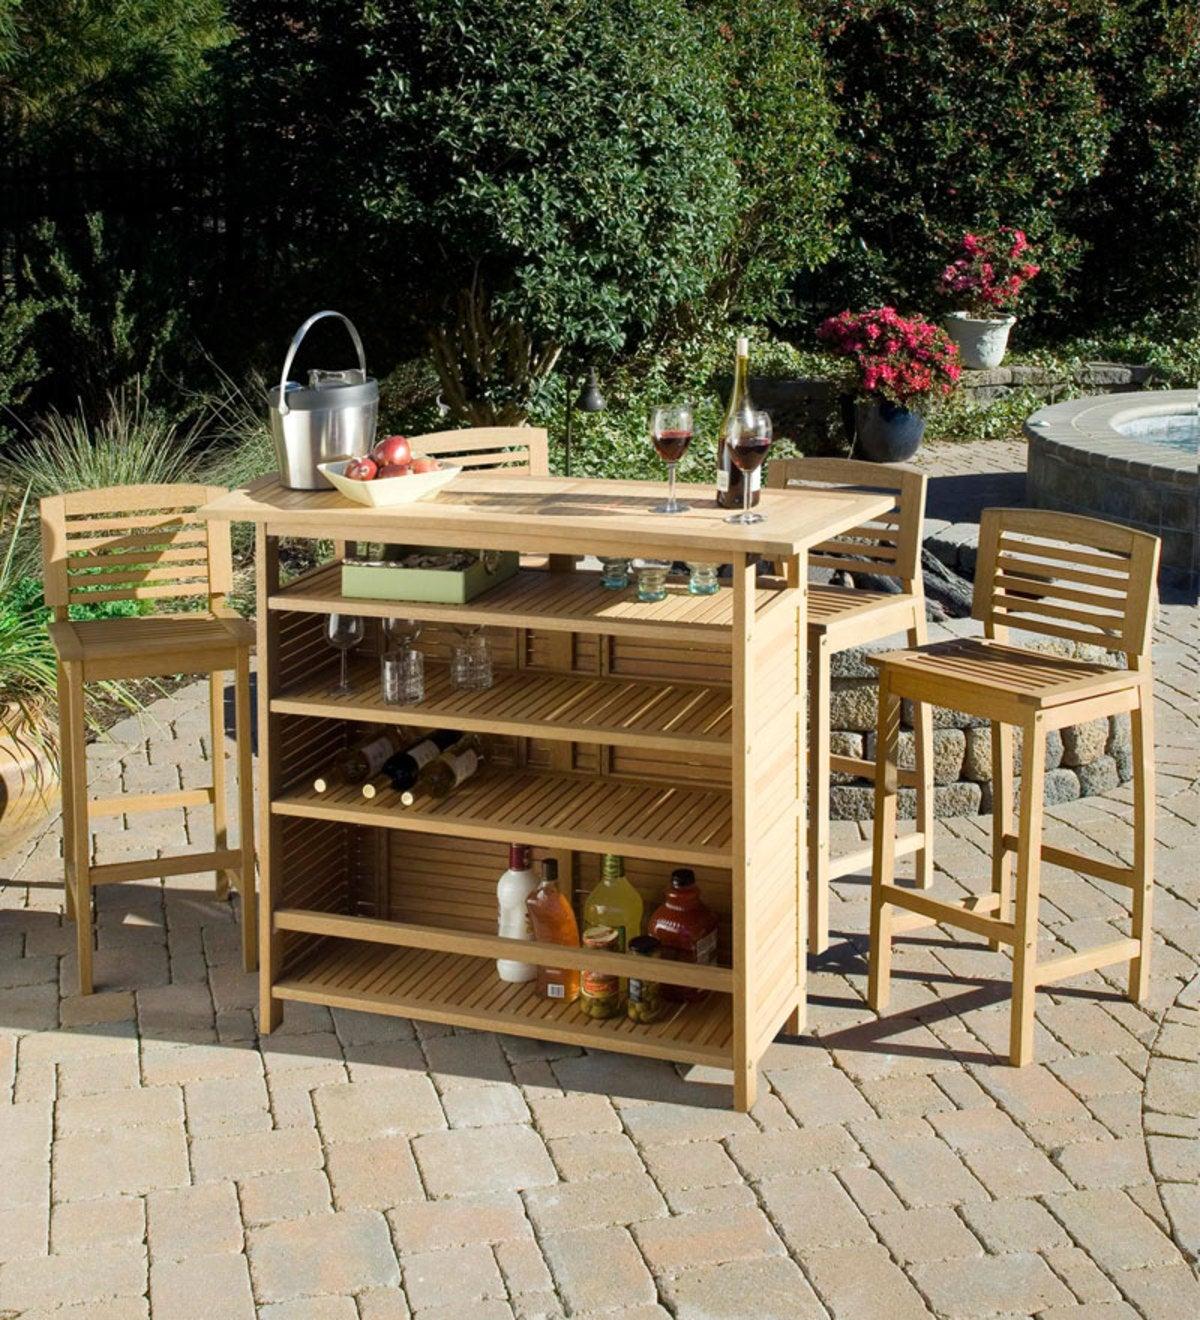 decorative indoor firewood rack outdoor fireplace wood.htm shorea wood bali hai outdoor bar cabinet plus 4 stools in a  shorea wood bali hai outdoor bar